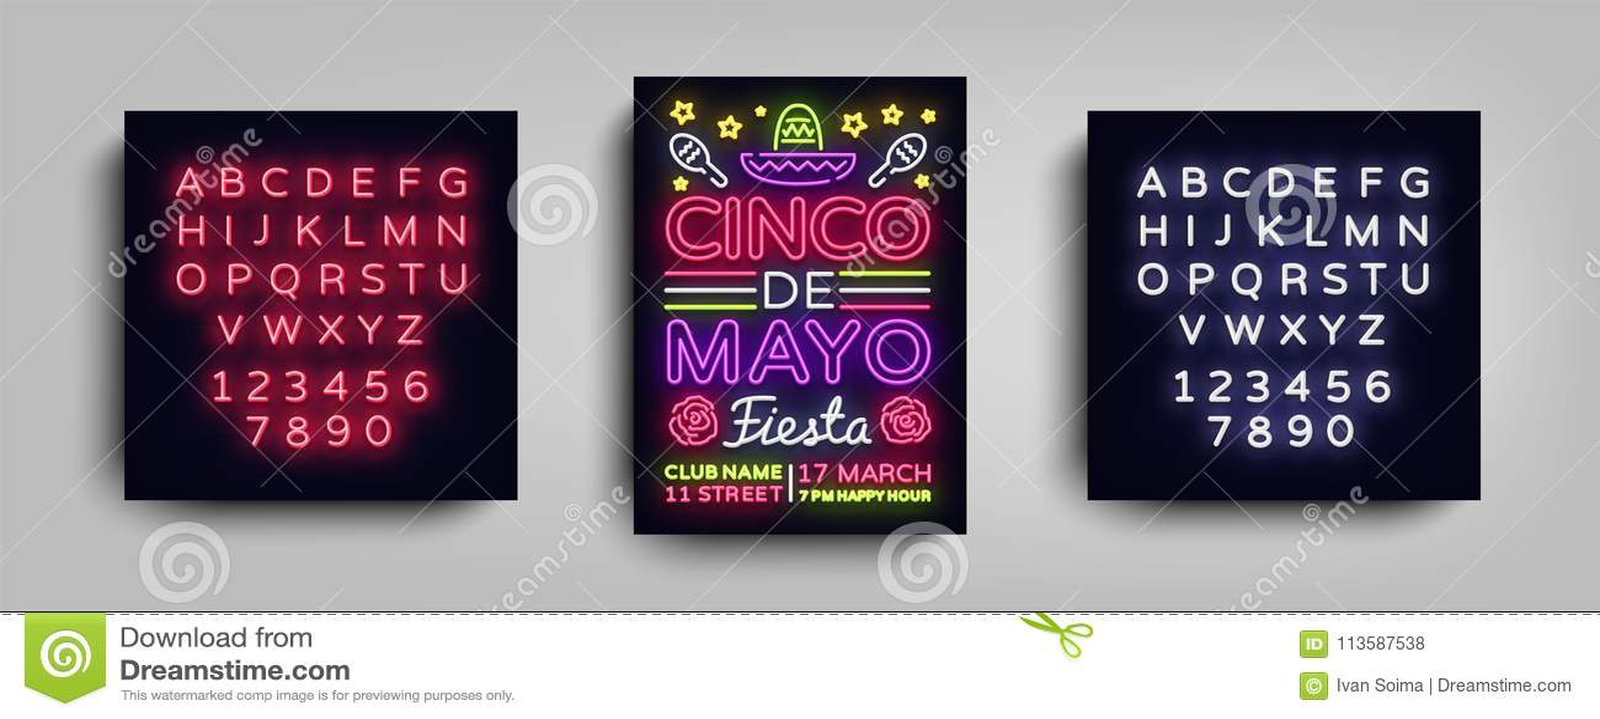 Cinco De Mayo Poster Design Neon Style Template Neon Sign